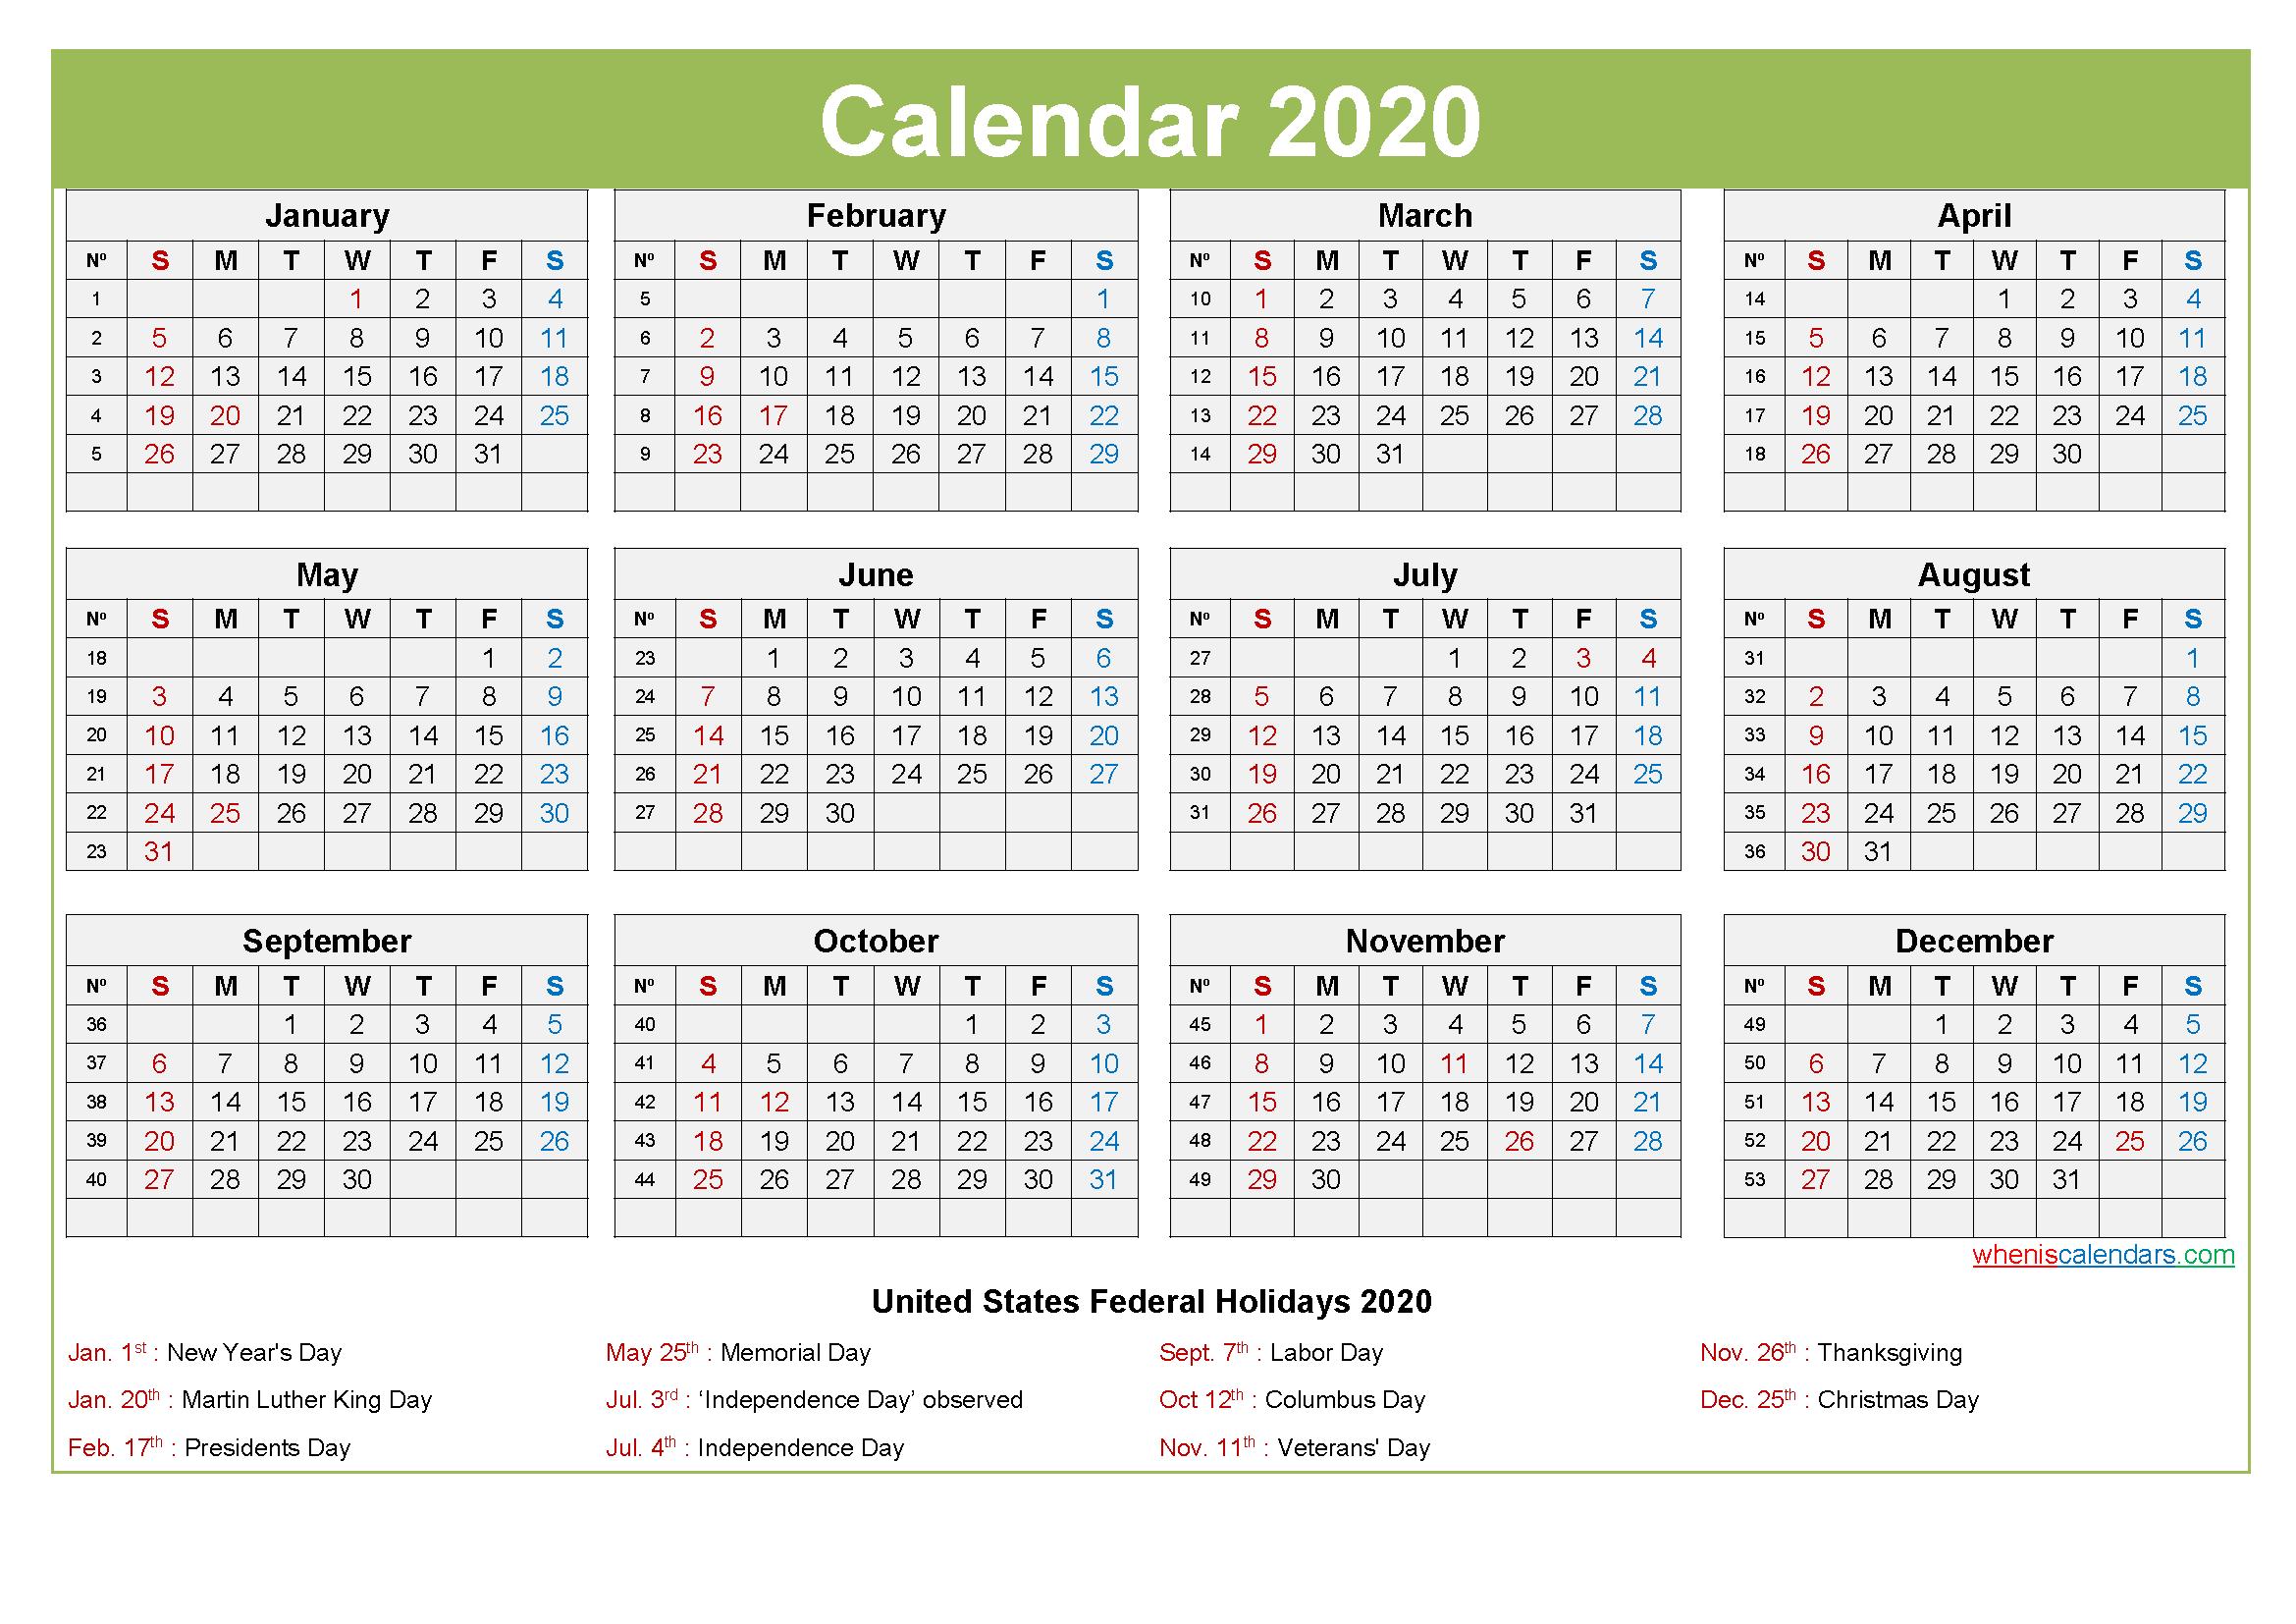 Computer Desktop Calendar 2020 with Holidays